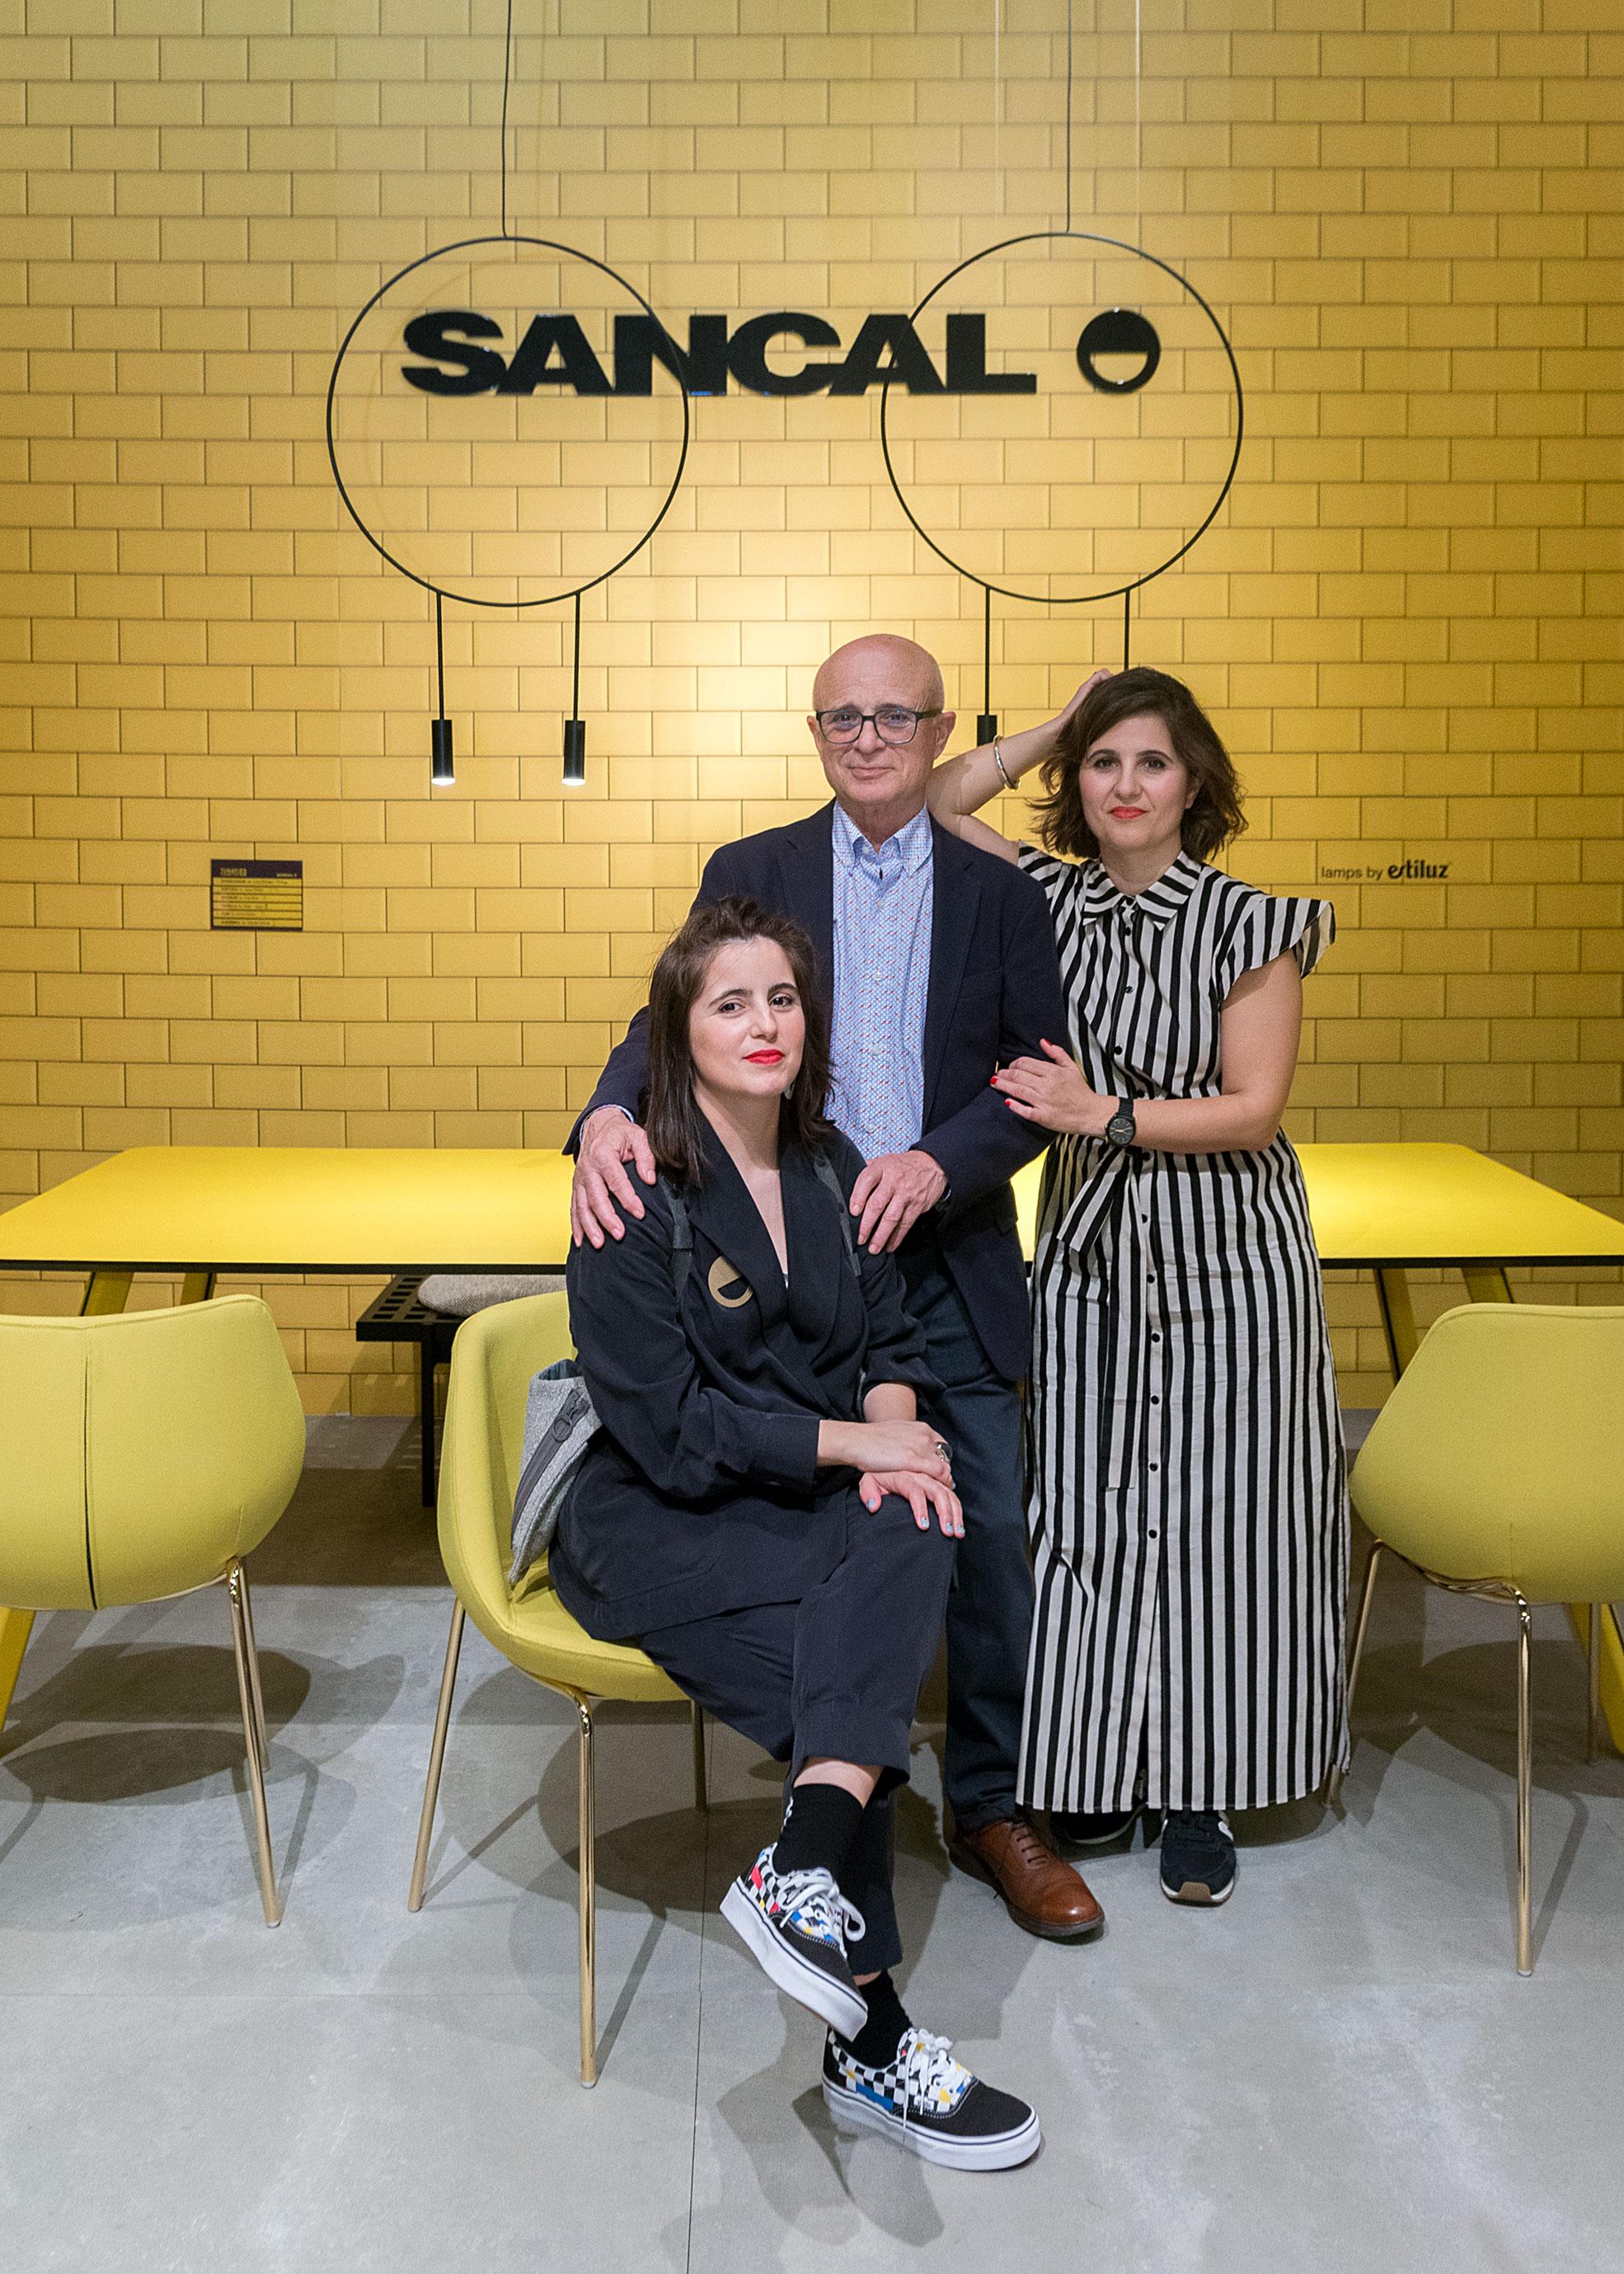 Potrait Sancal Team at Salone del Mobile 2019 Milan